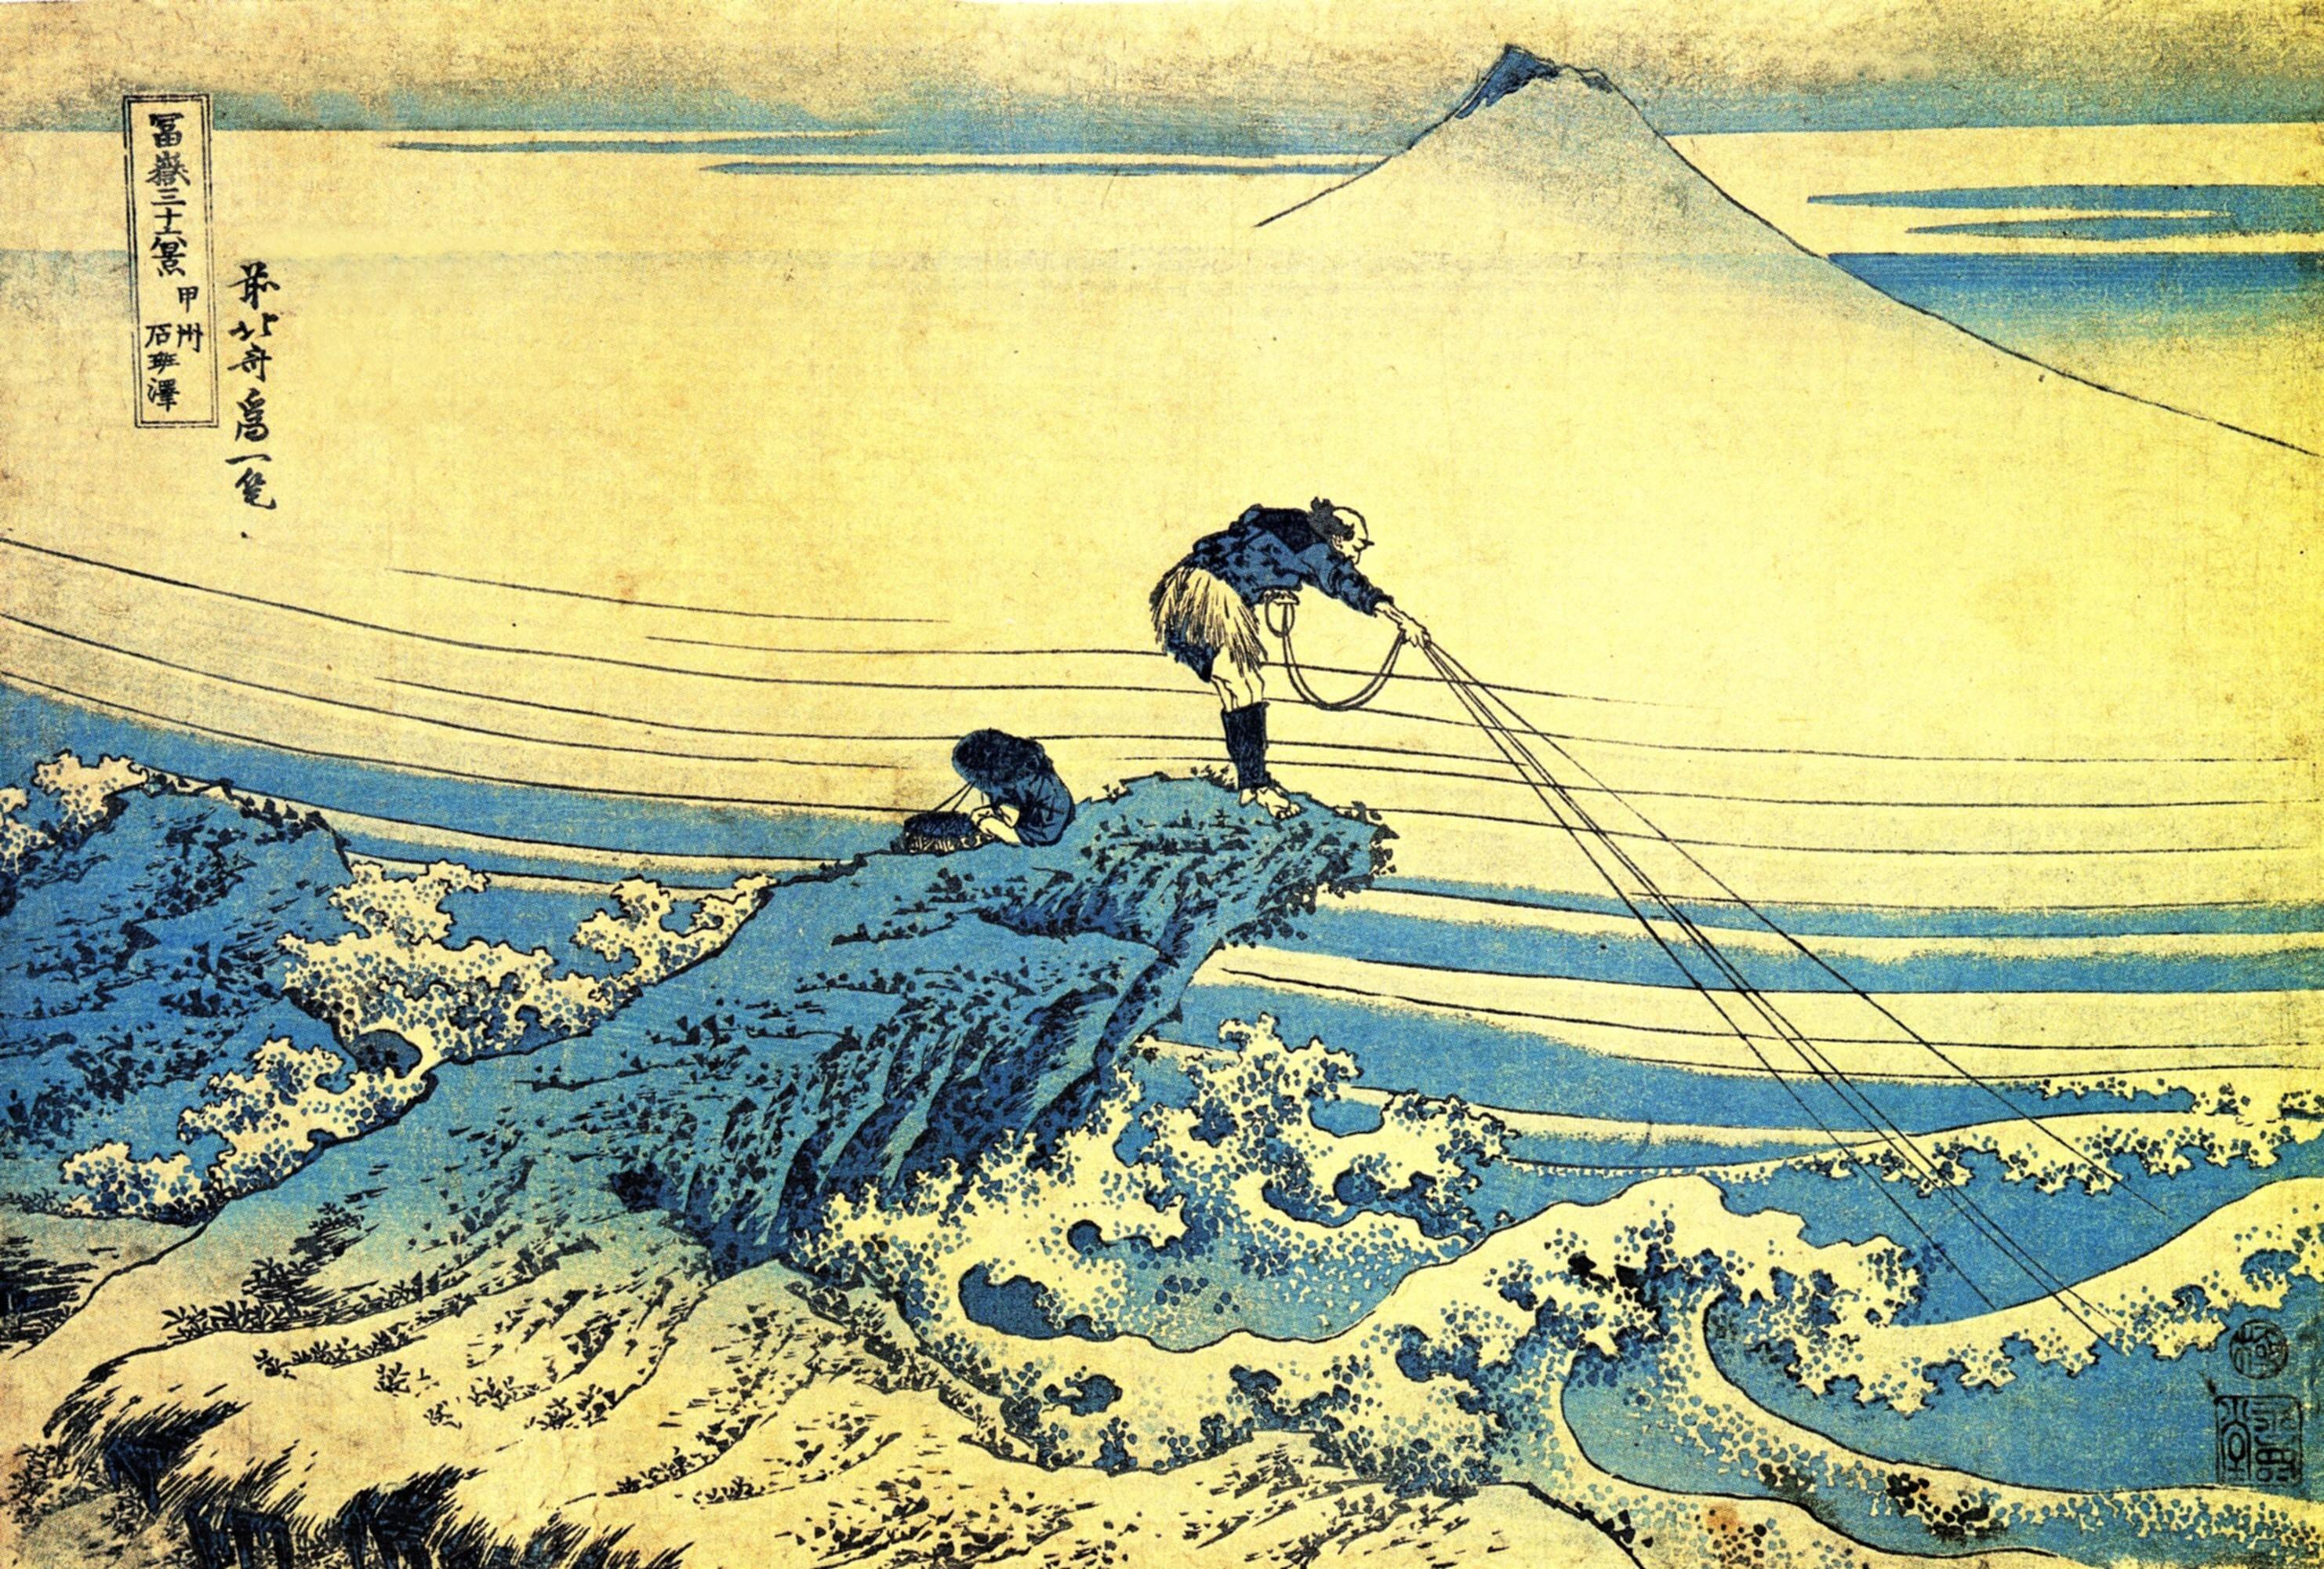 Desktop Wallpaper Hokusai h682536 Comics HD Images 2964x2001